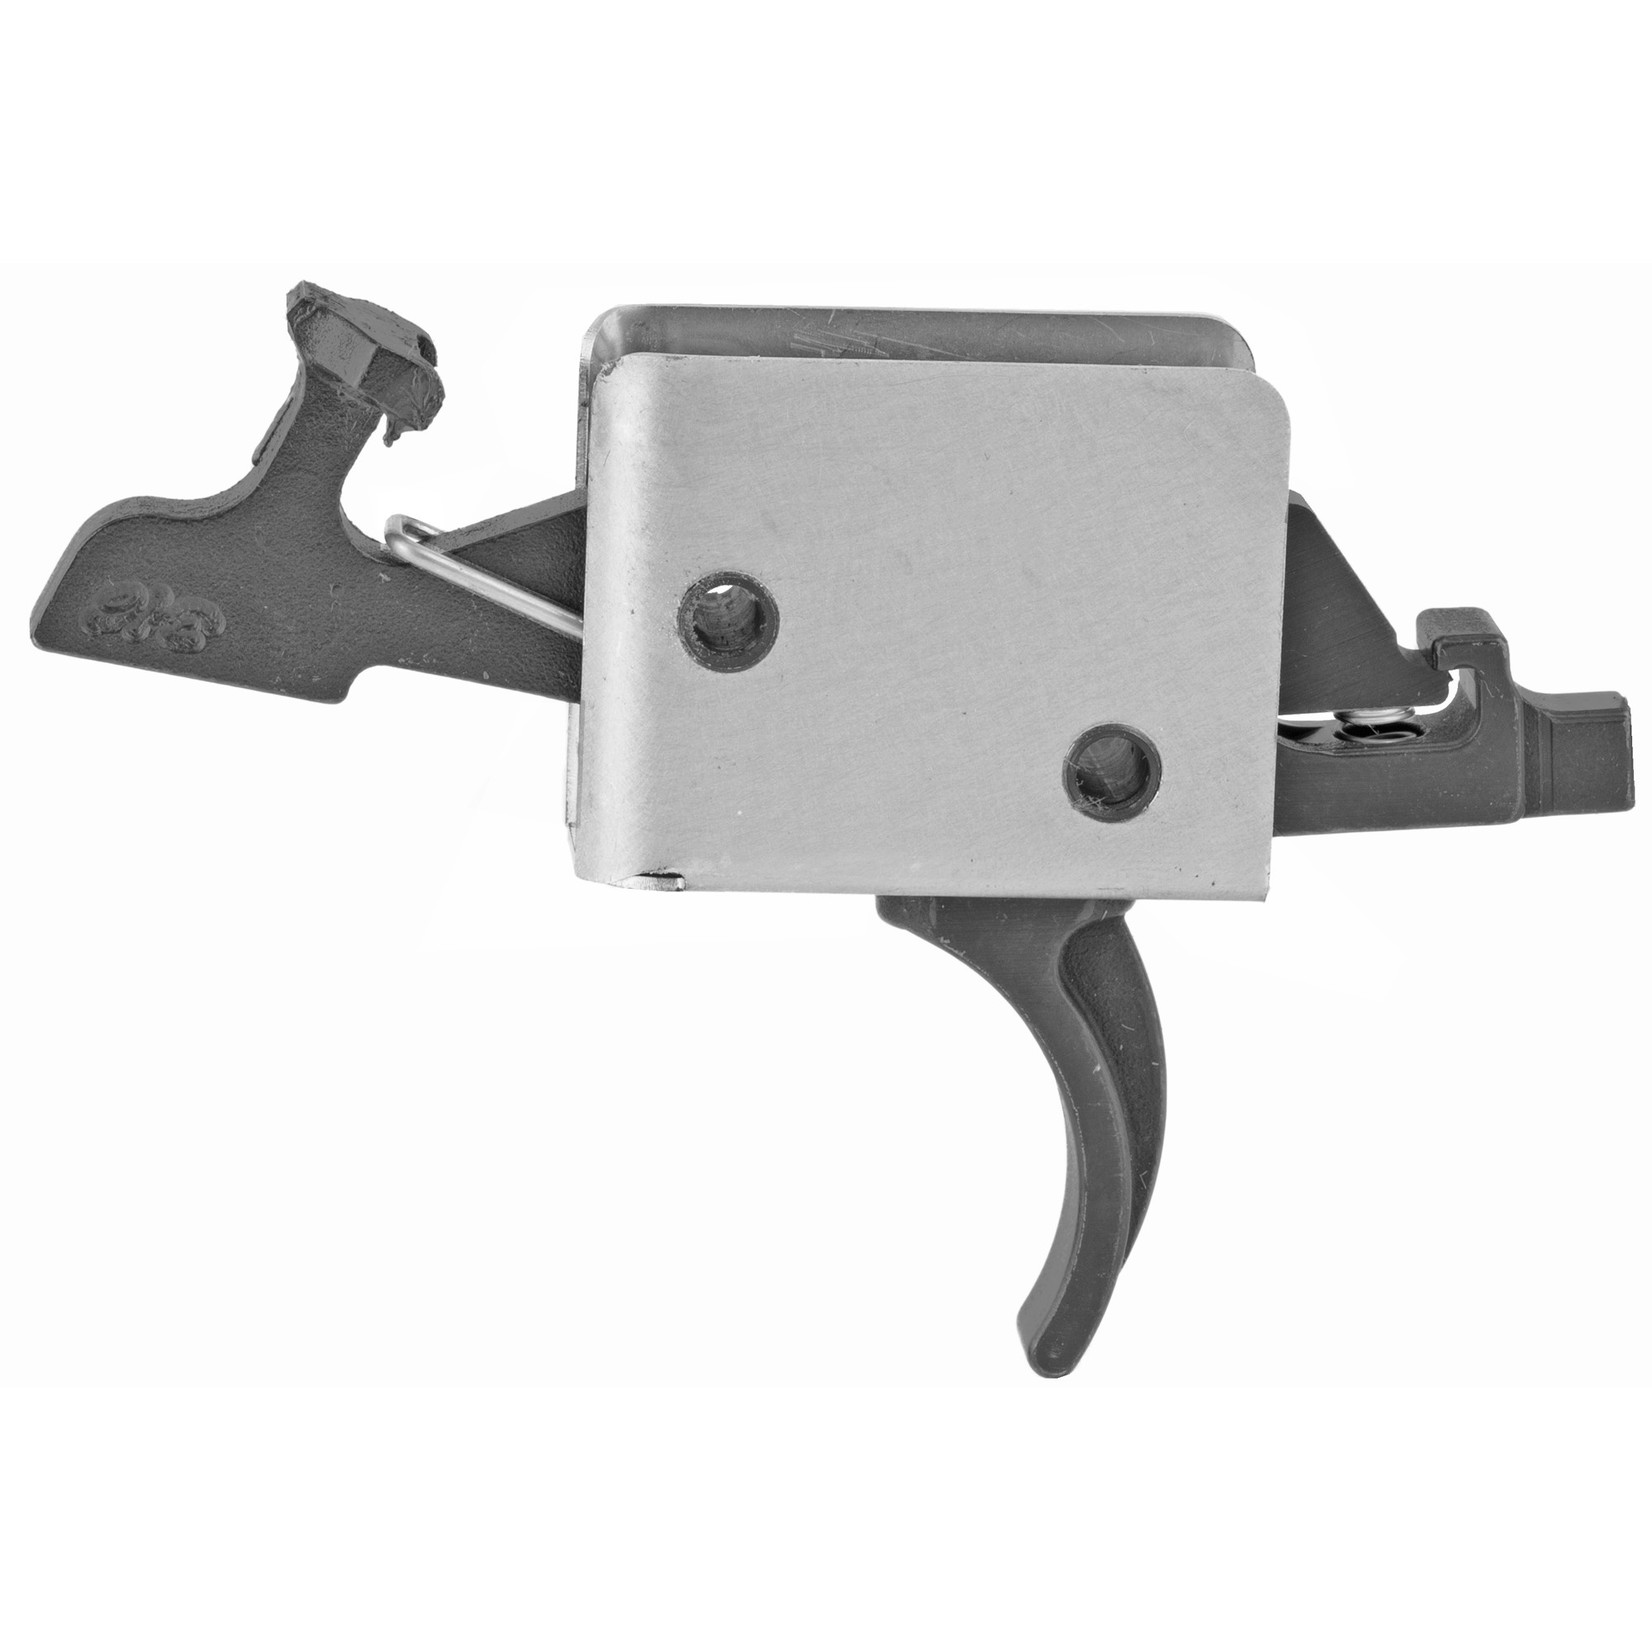 CMC CMC AR-15 2-Stage Trigger Curve